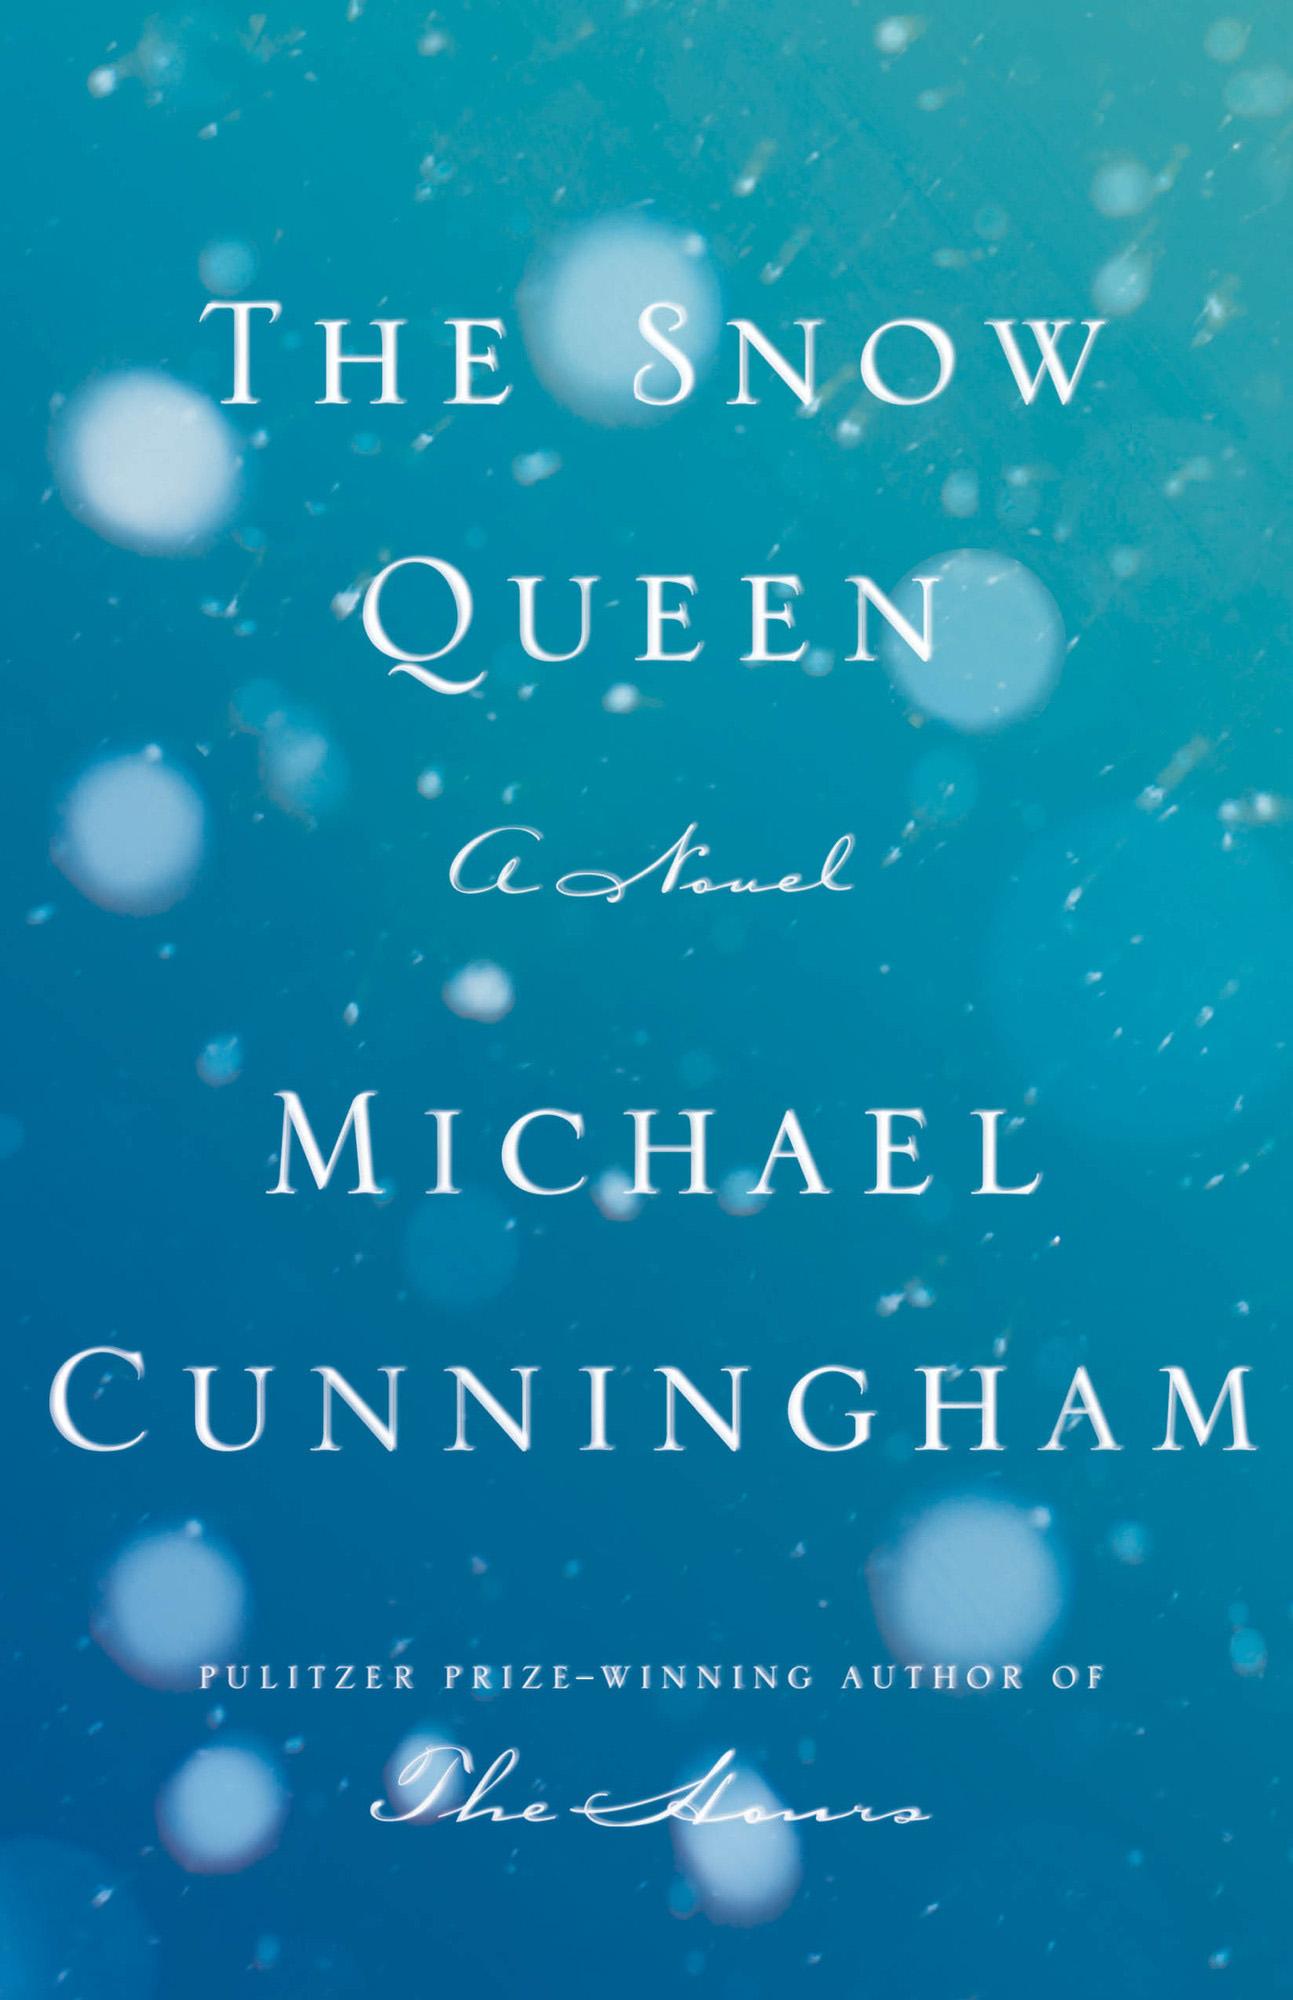 The snow queen di Michael Cunningham.